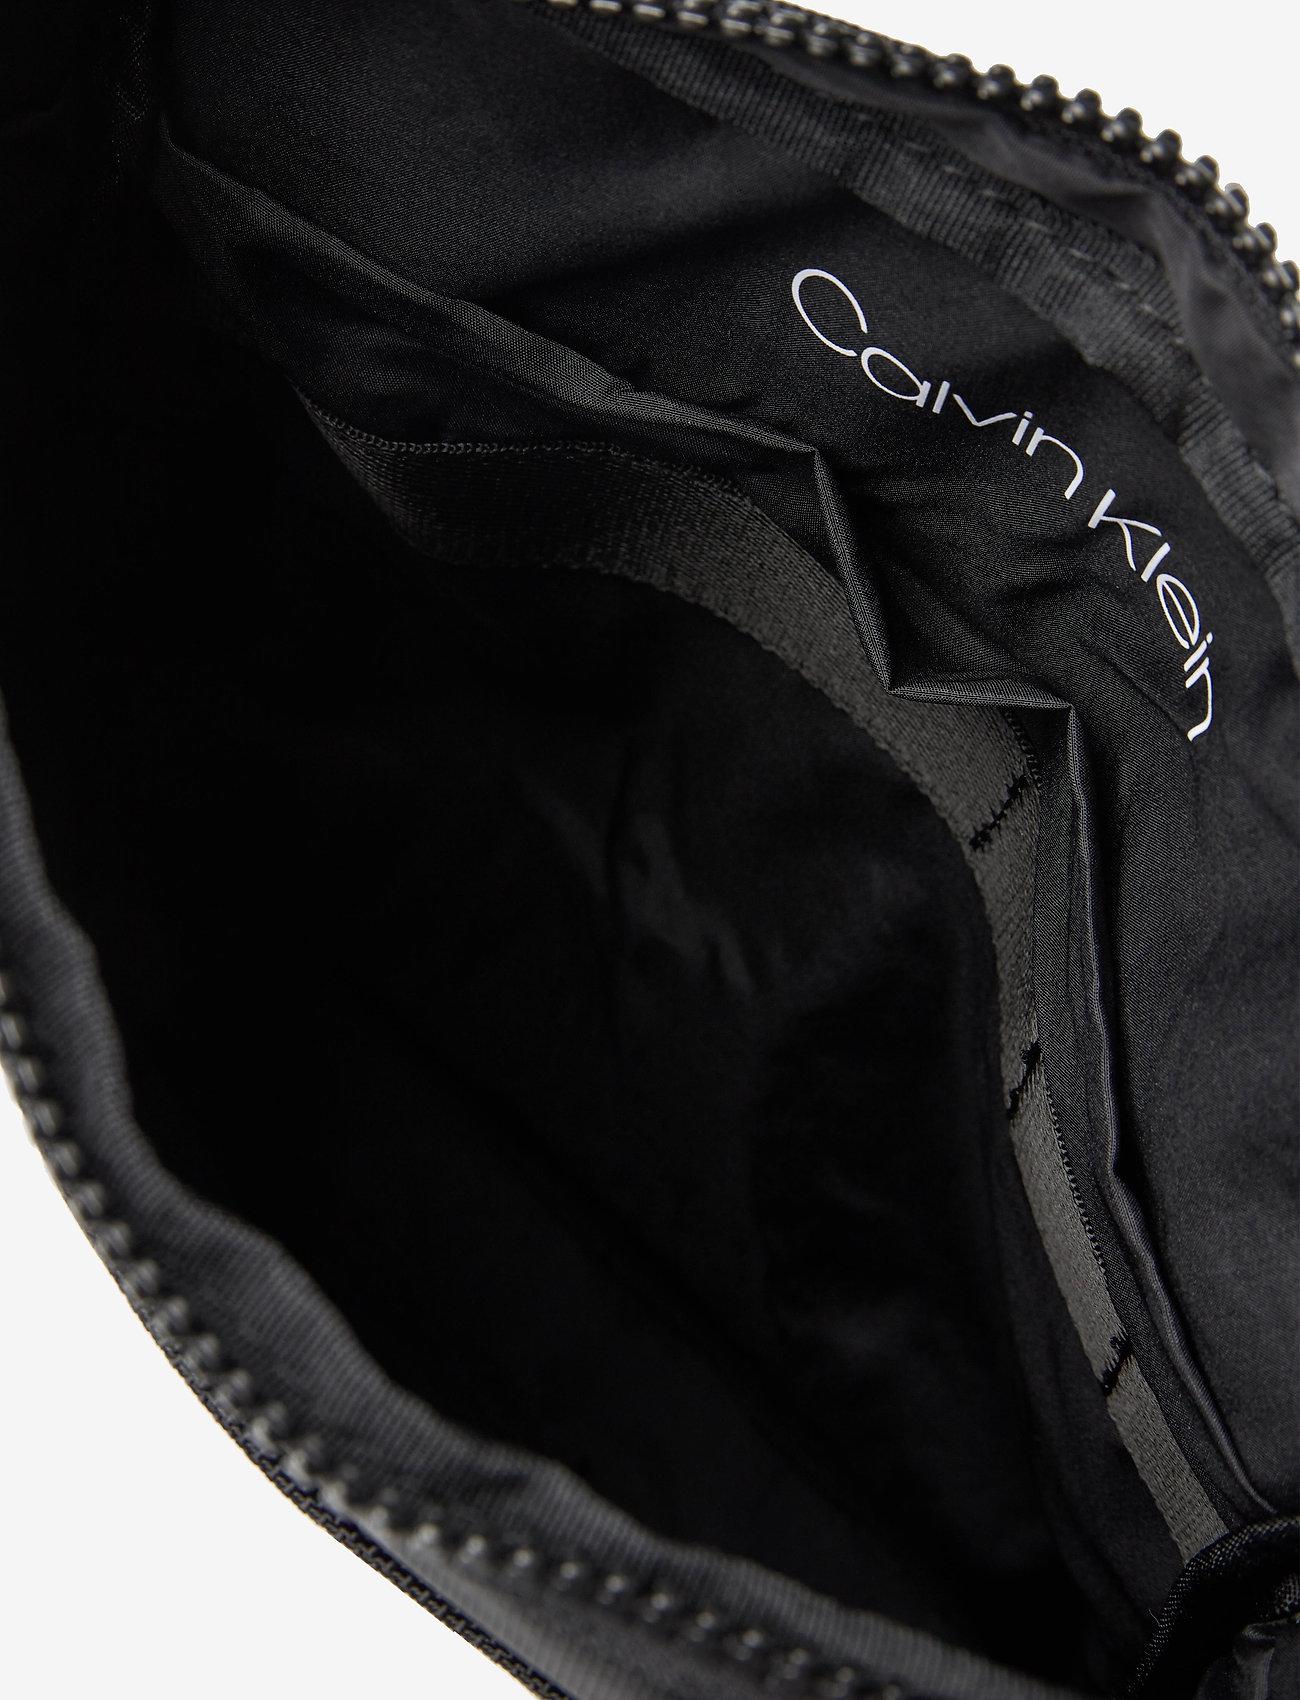 Calvin Klein - ULTIMATE NYLON FLAT - sacs à bandoulière - black - 4